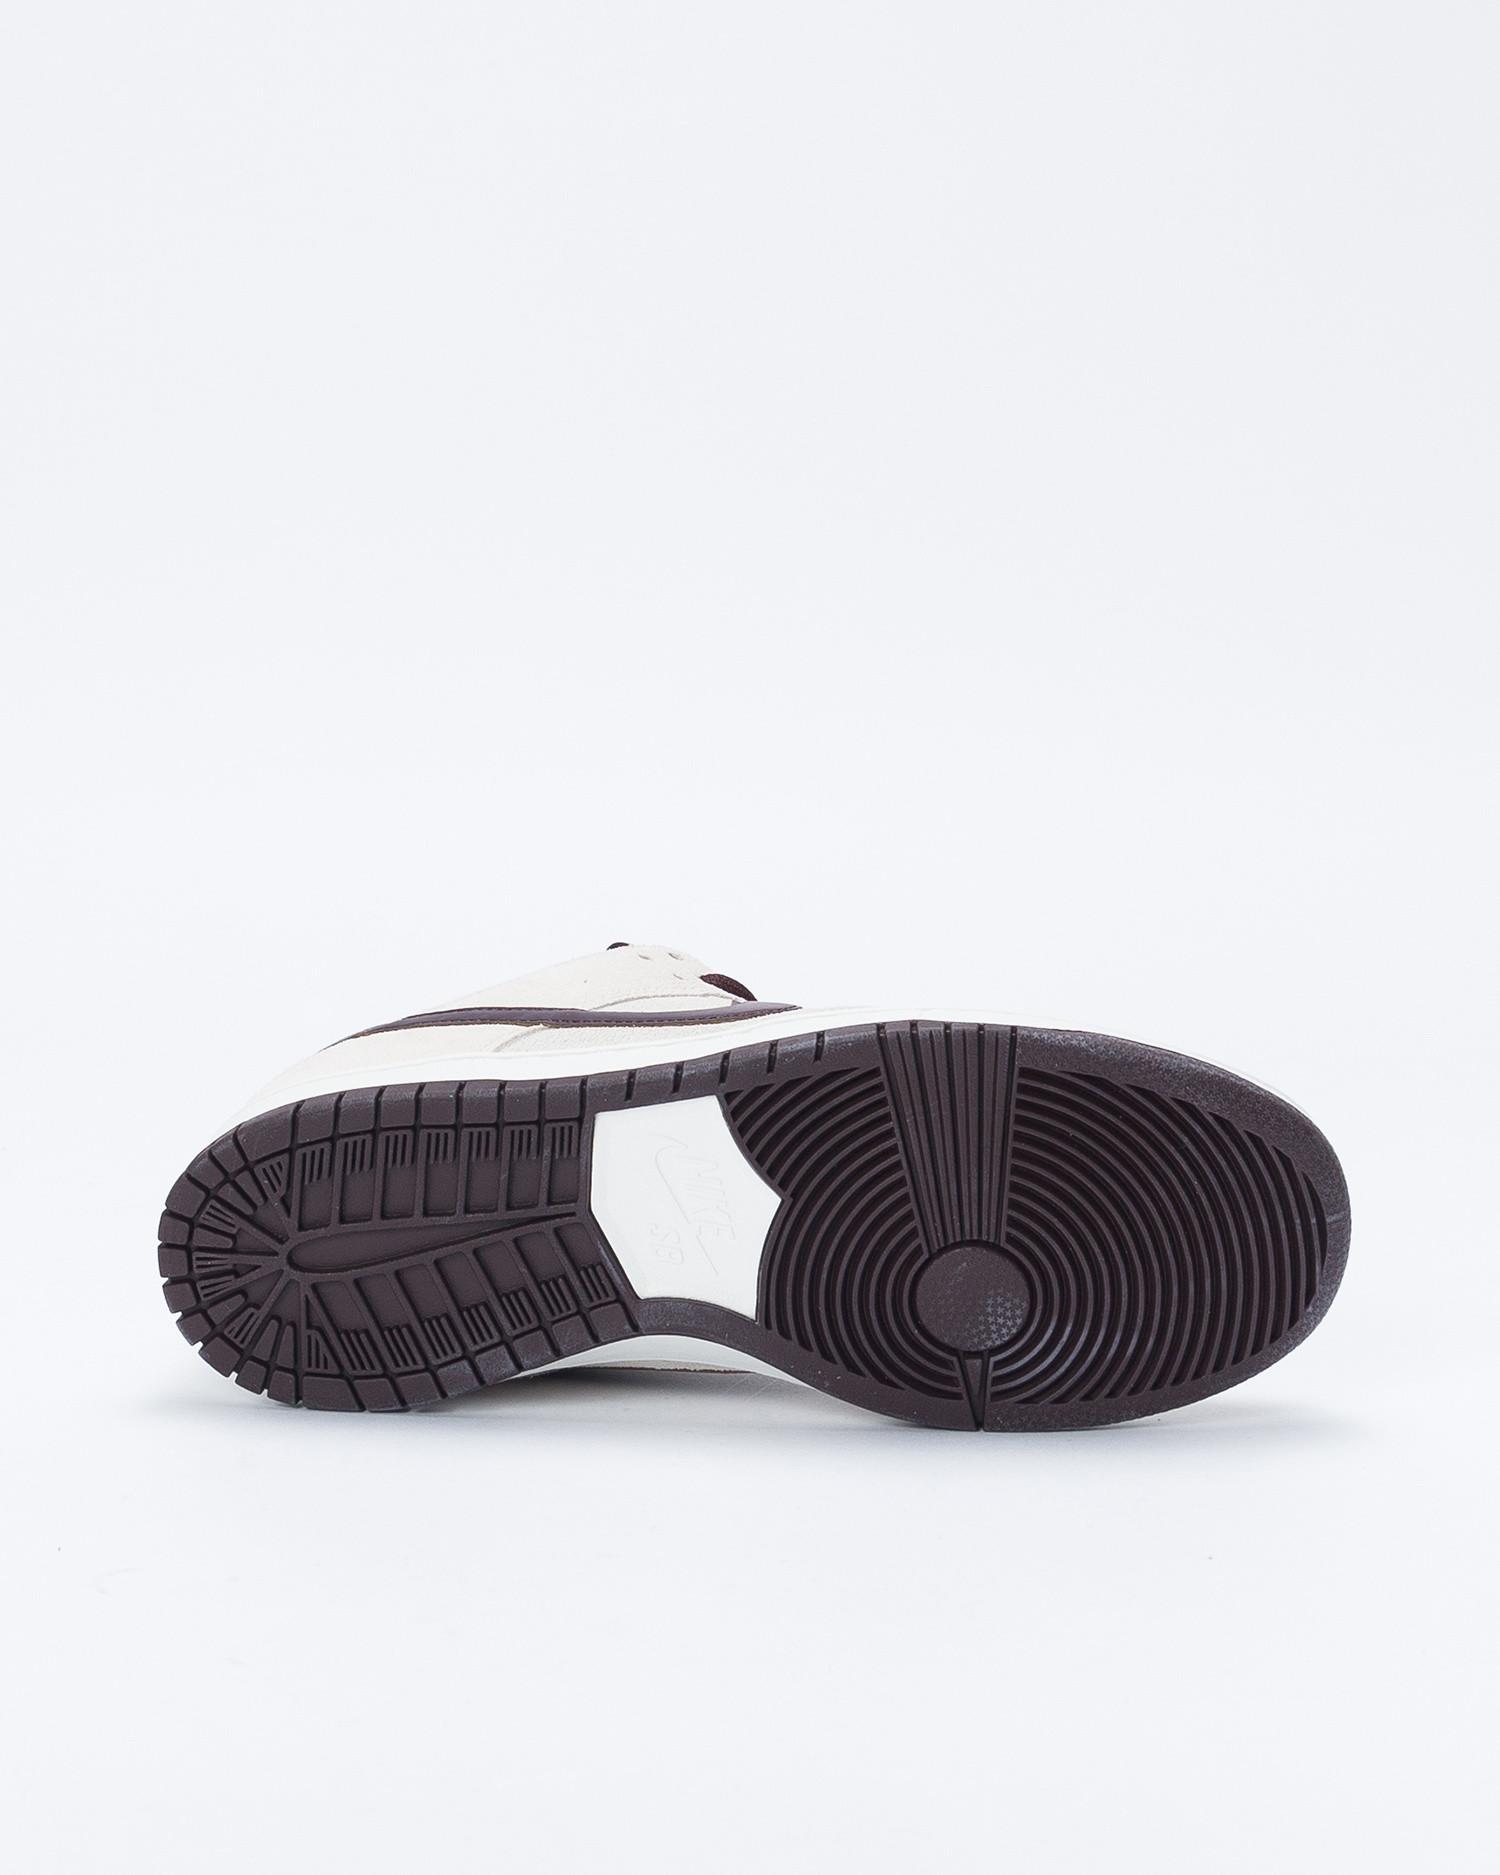 Nike SB Dunk Low Pro Desert Sand/Mahogany-Summit White